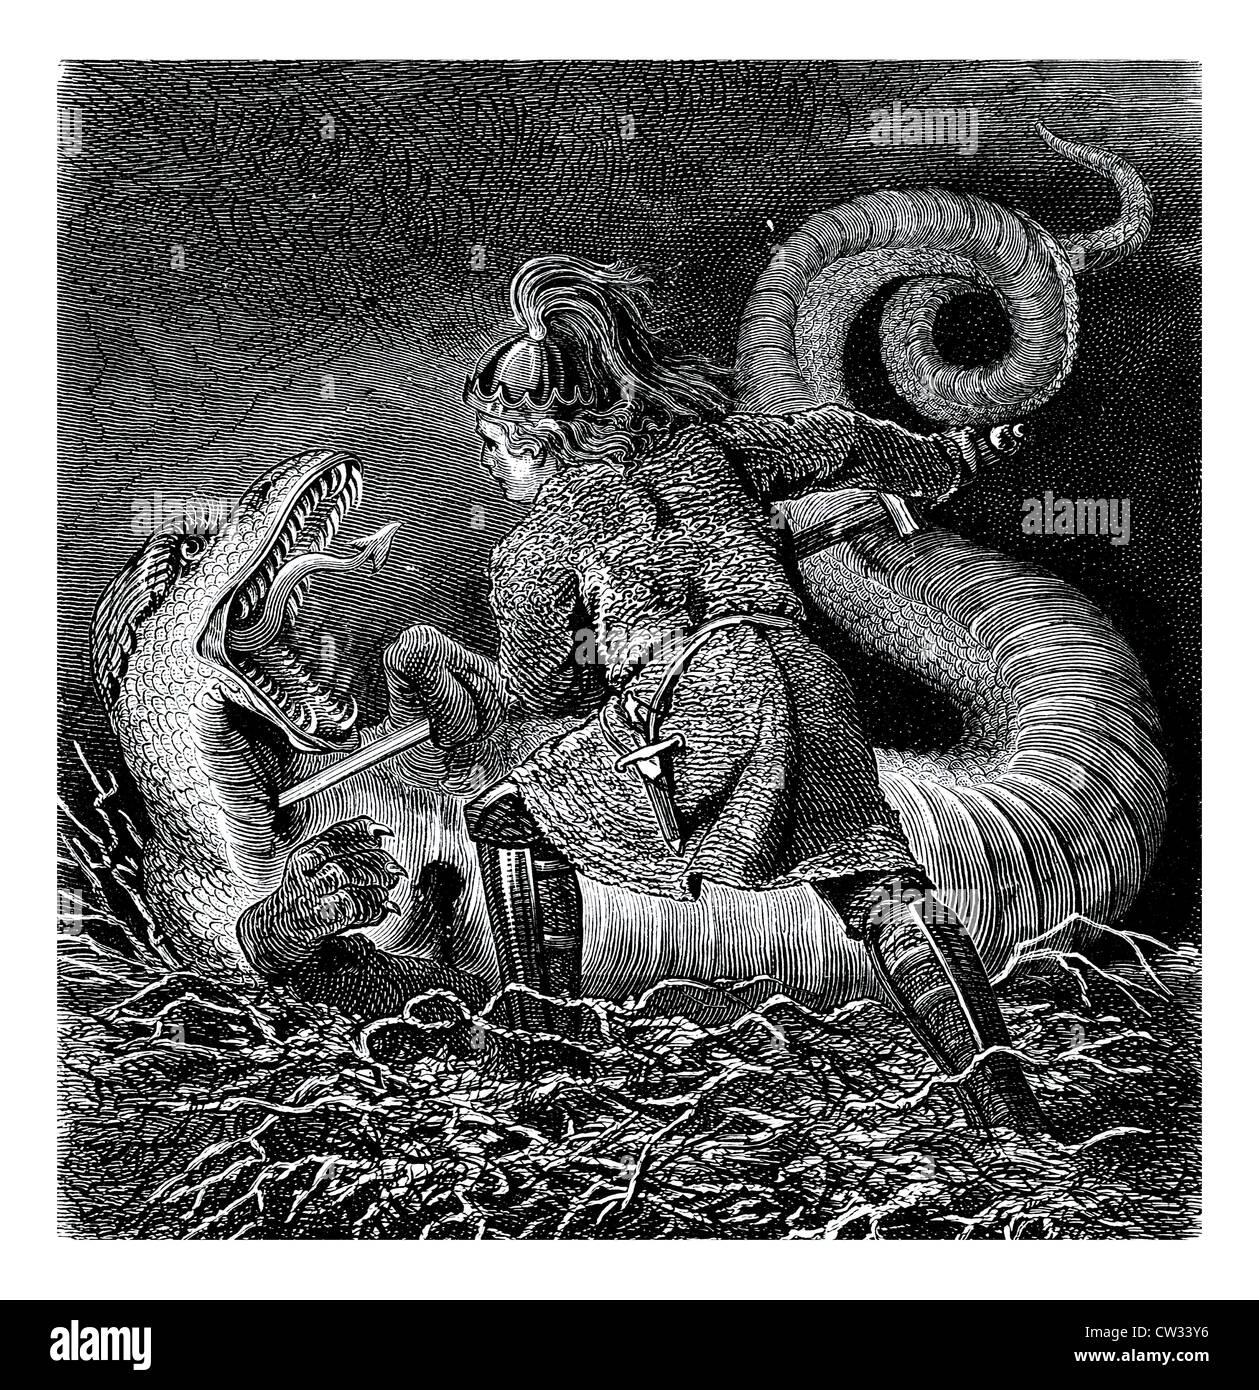 Sigurd killed the dragon - Stock Image